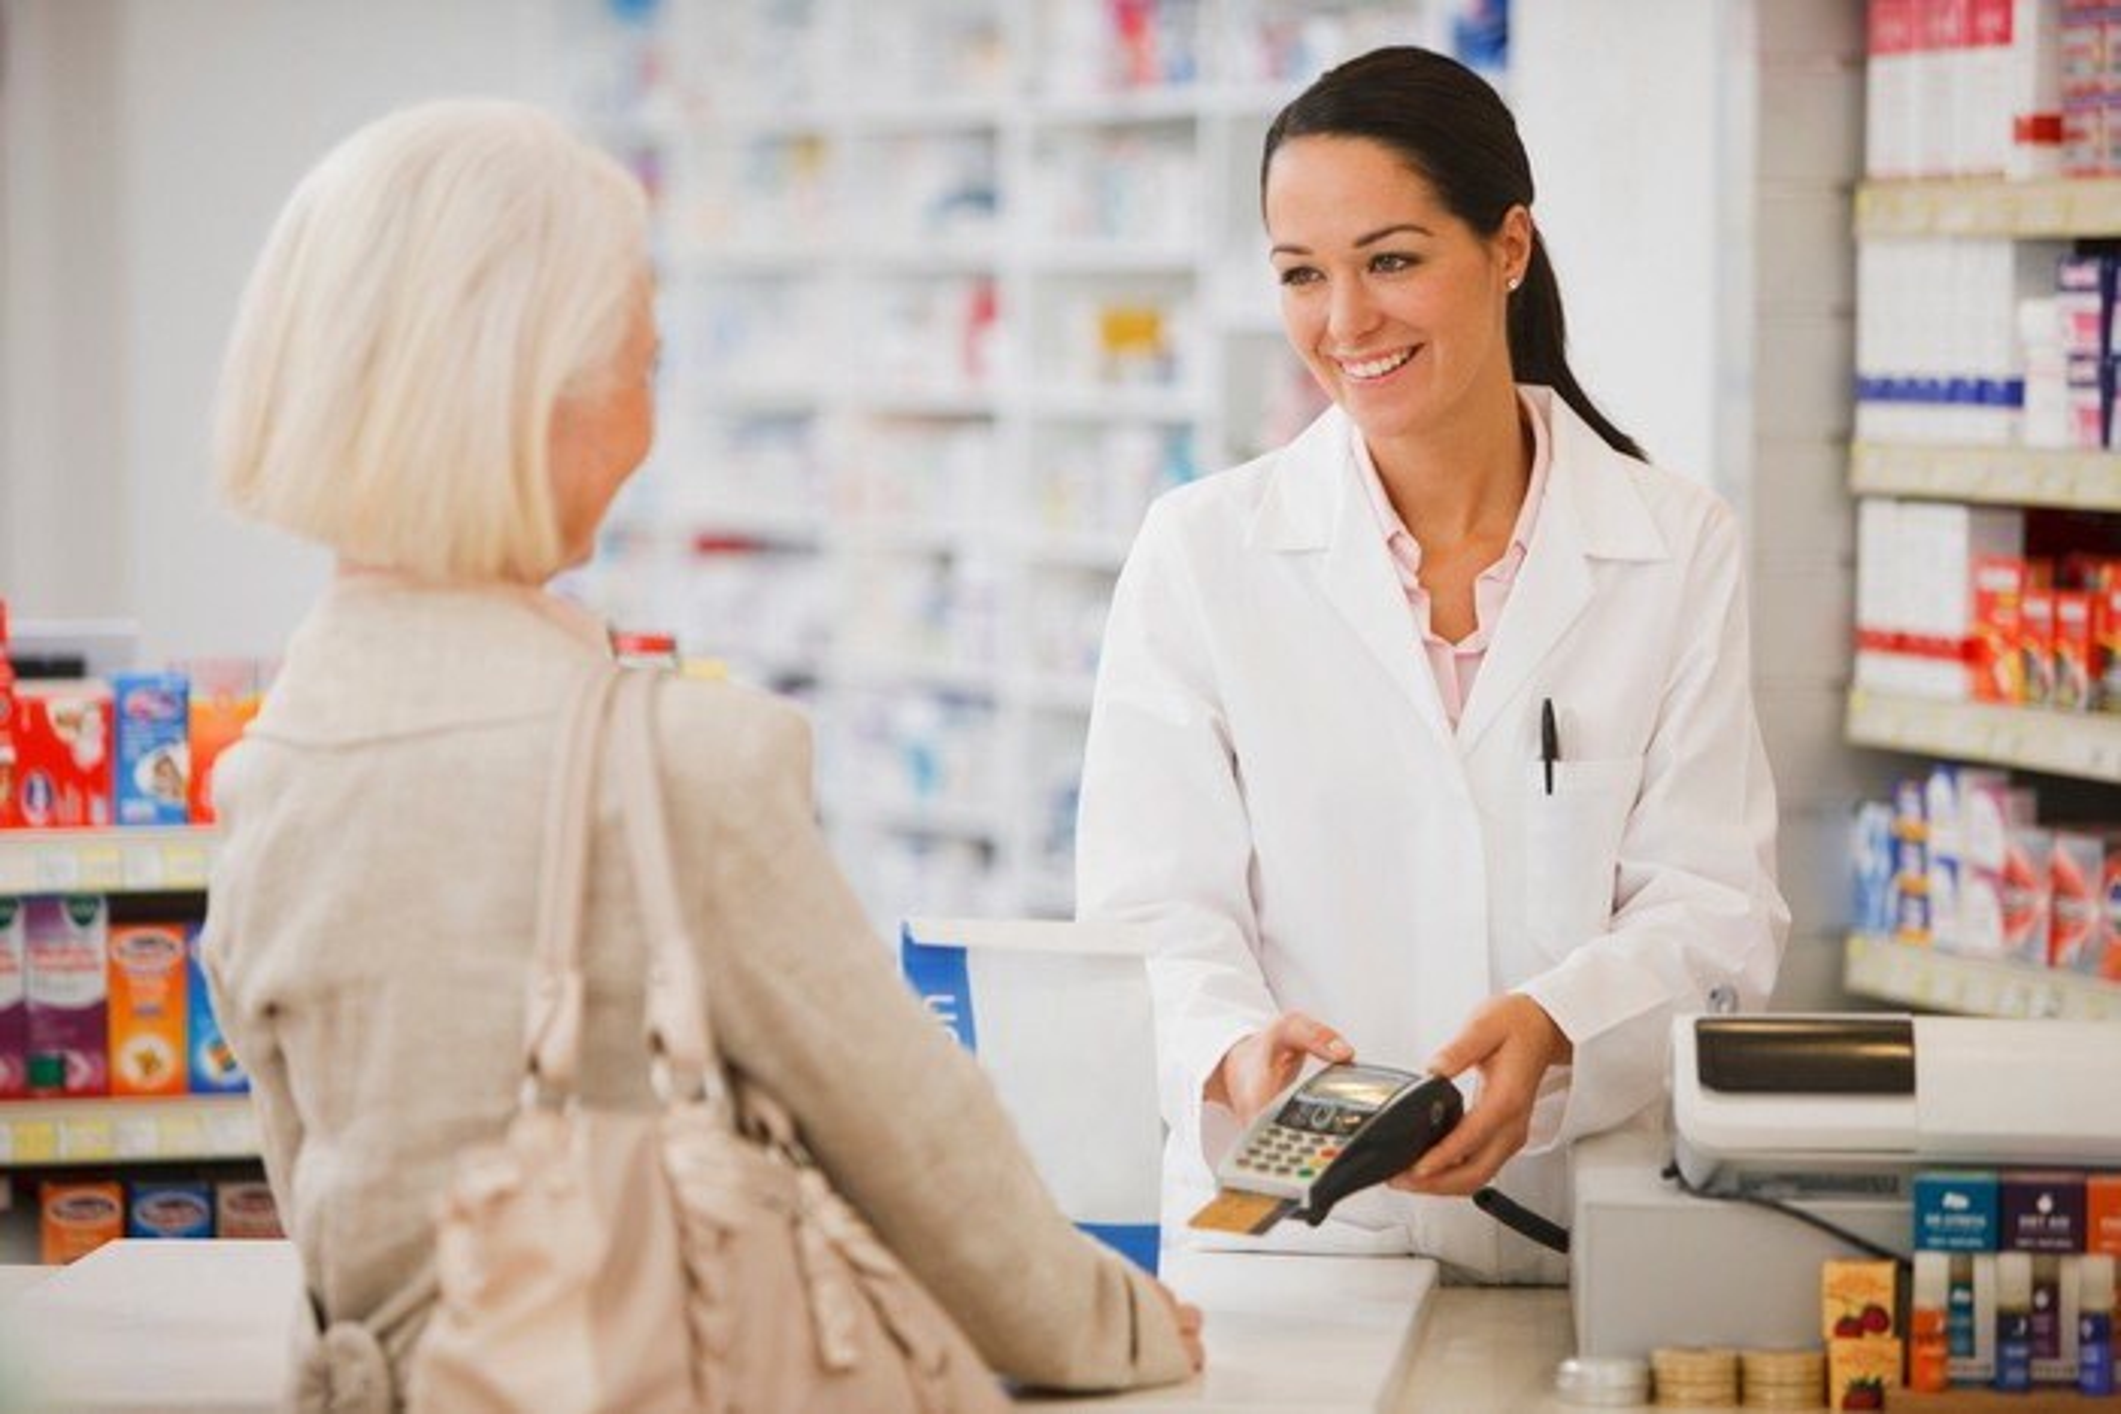 Pharmacist smiling at gray-haired female customer